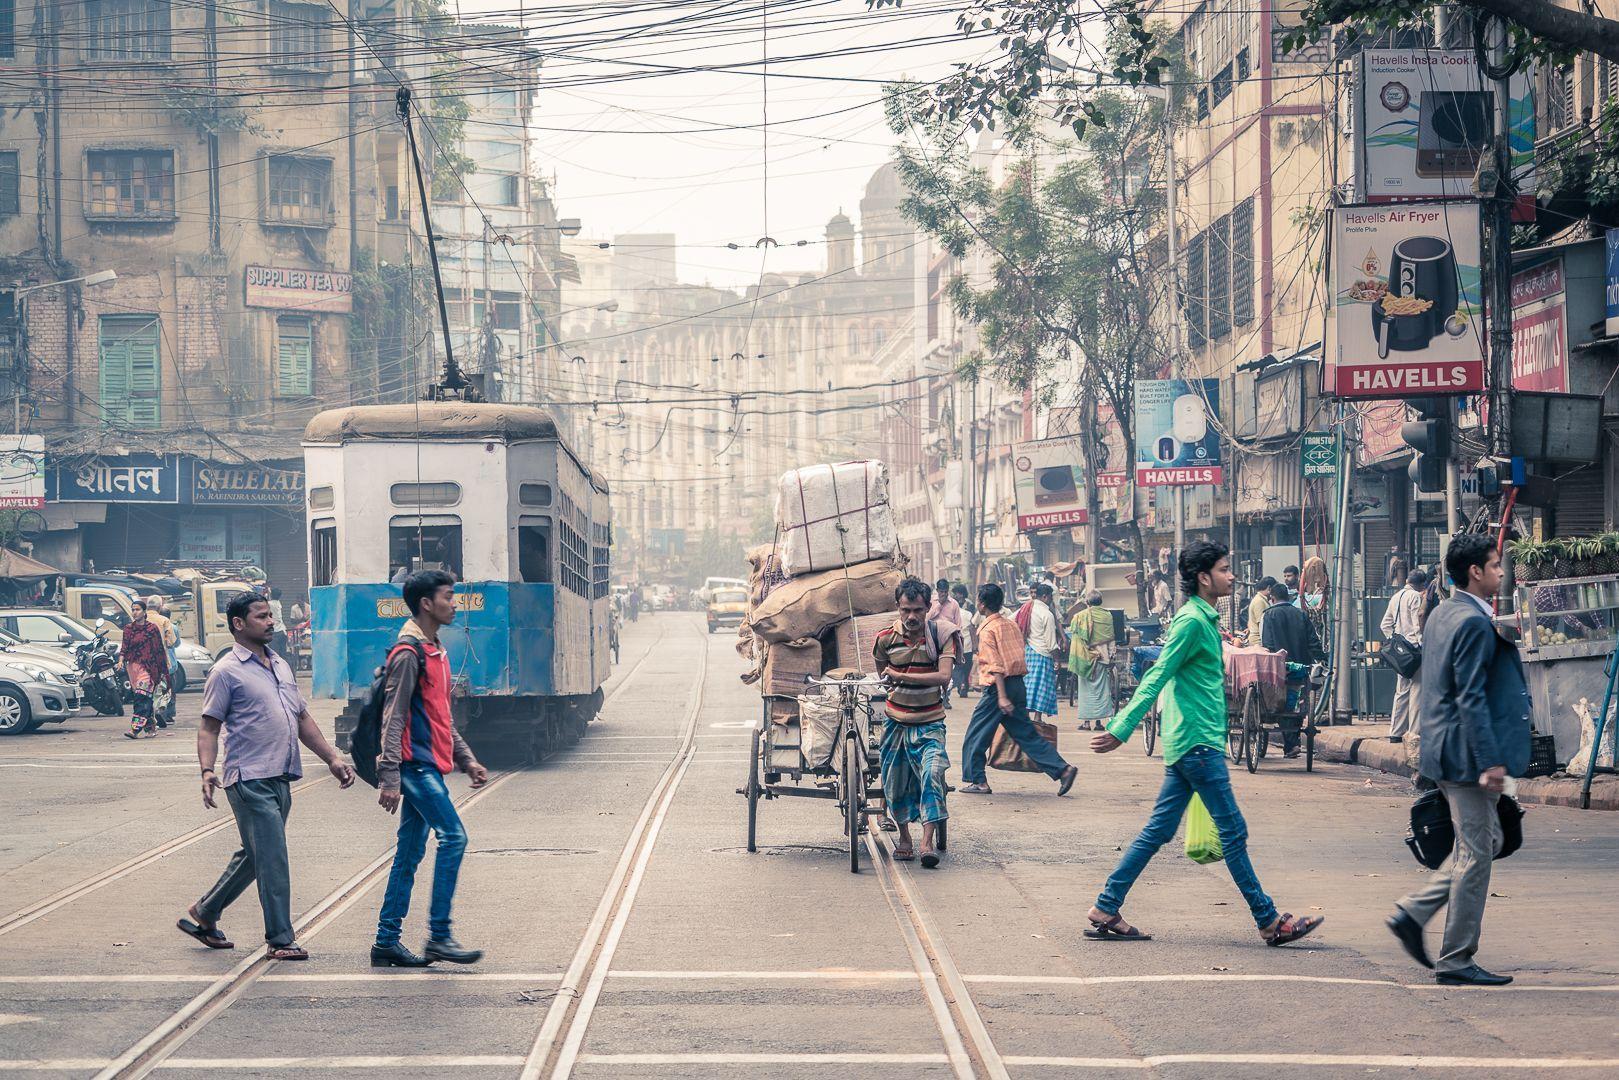 Busy Tram Lines Kolkata Tea Abroad By Jamie Ahmad Street